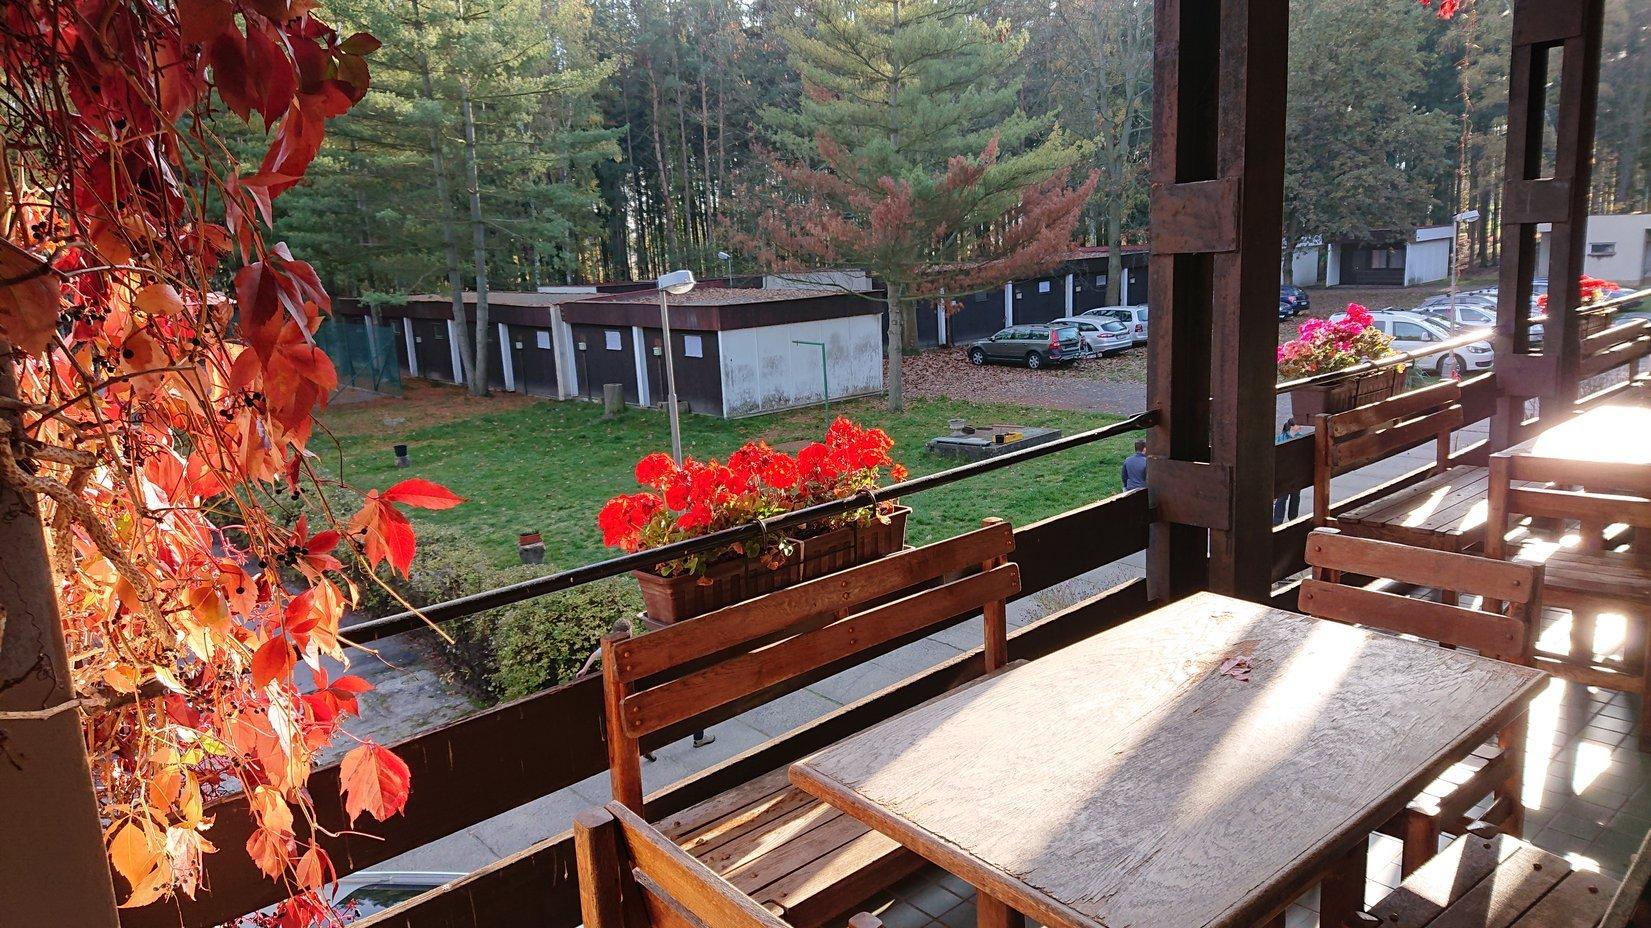 g191026022-Lesni-hotel-ROB-2019